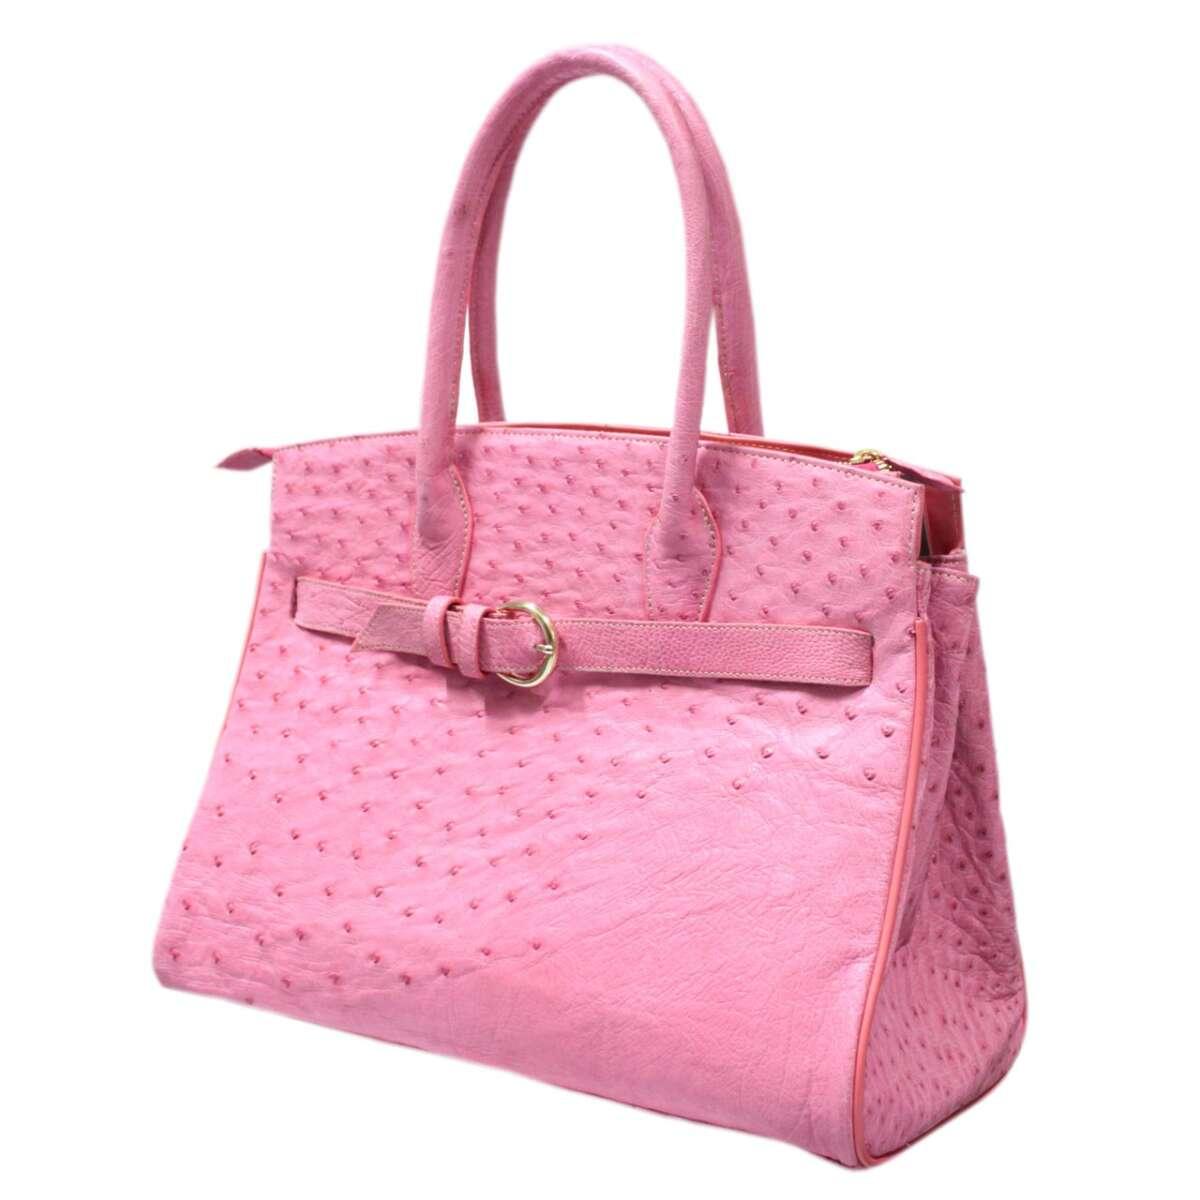 Túi xách nữ da đà điểu E007a